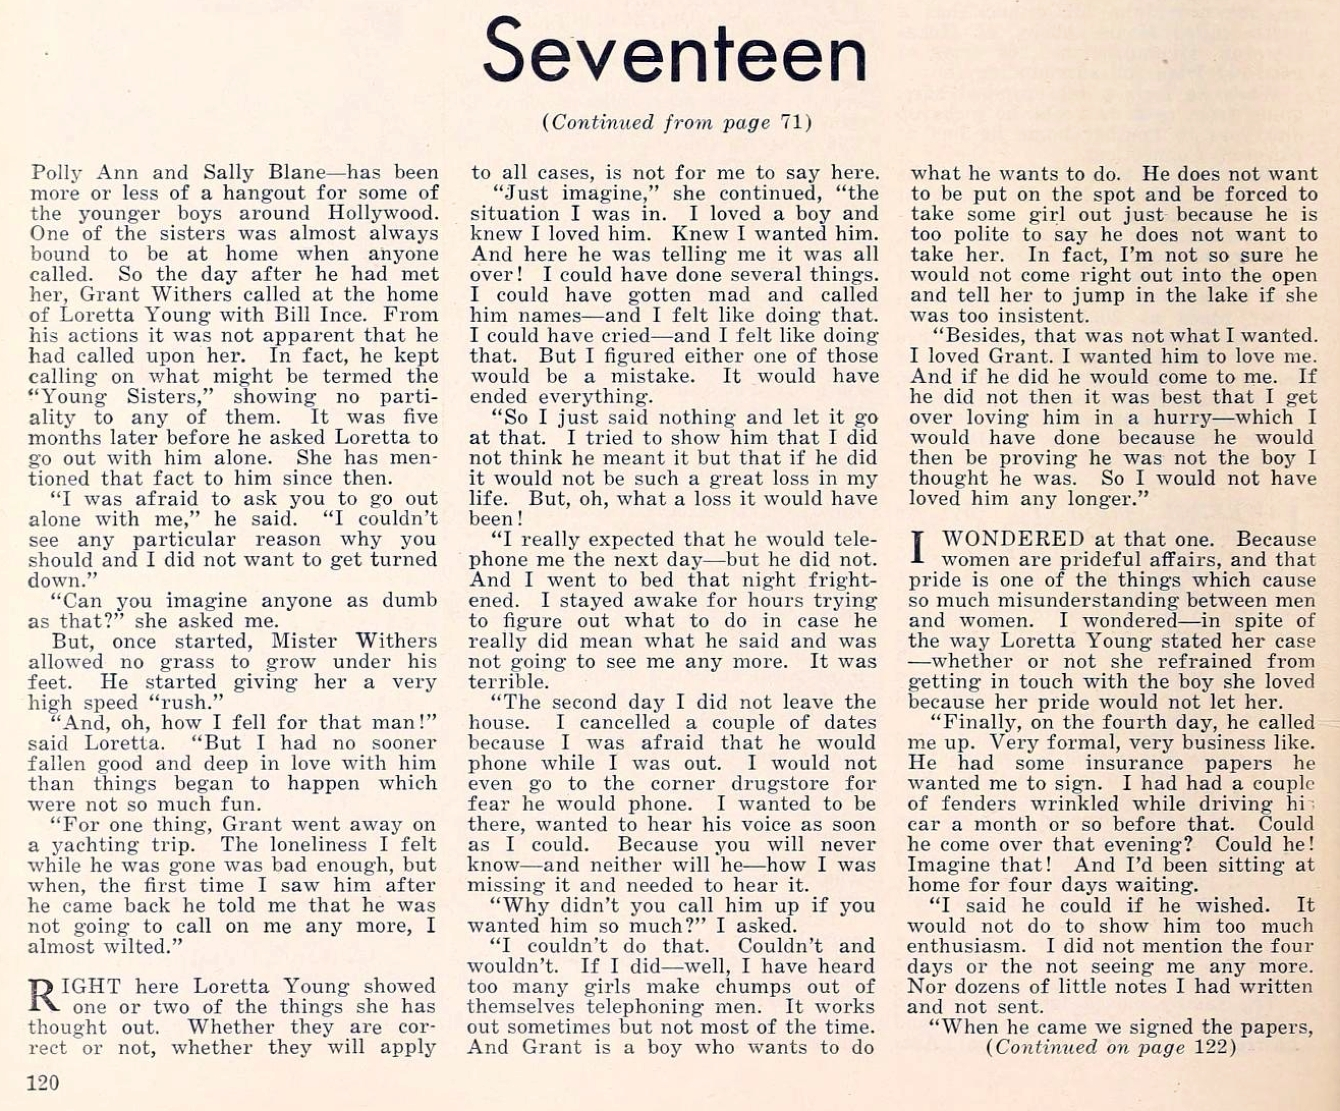 loretta young the new movie magazine april 1930 article 01a